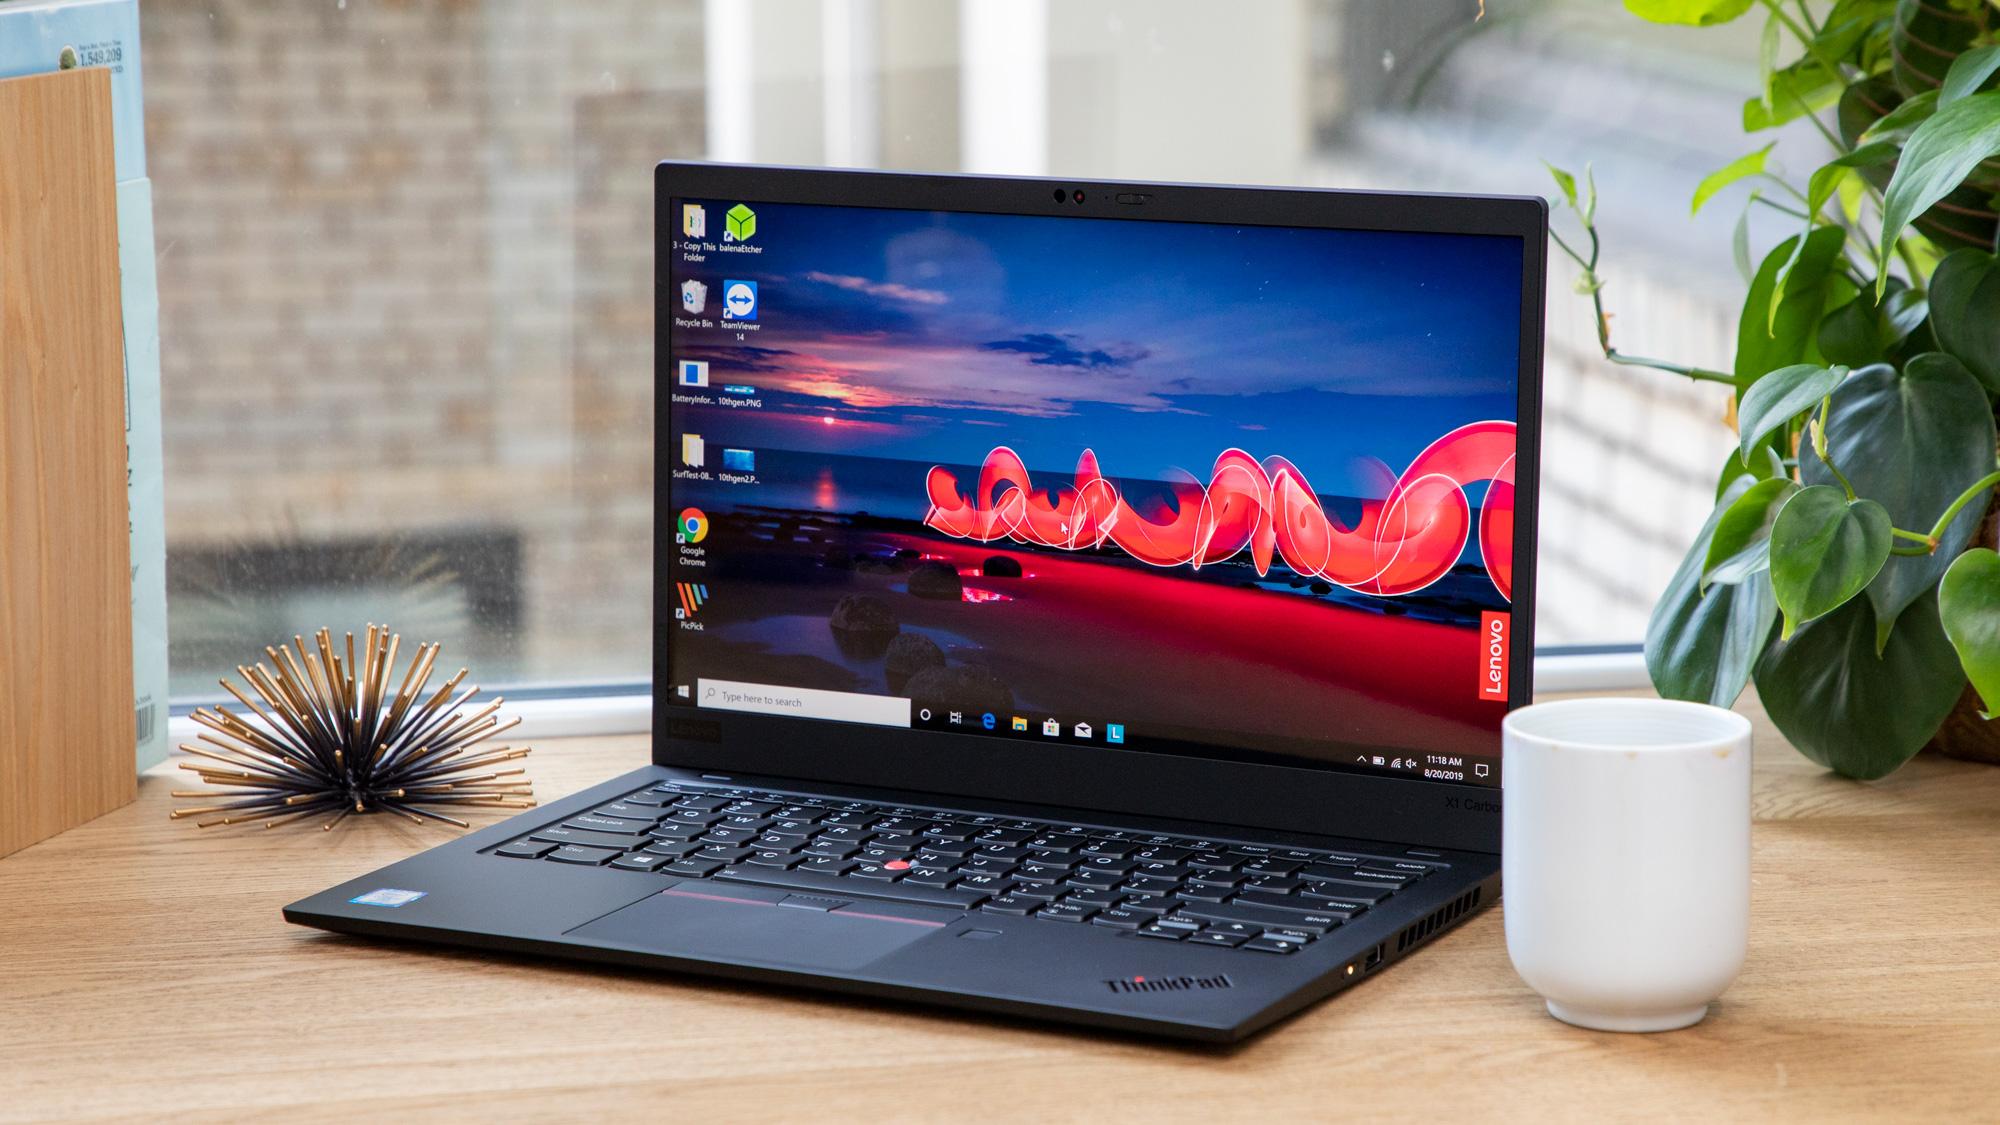 Best Laptop for Business Under 700